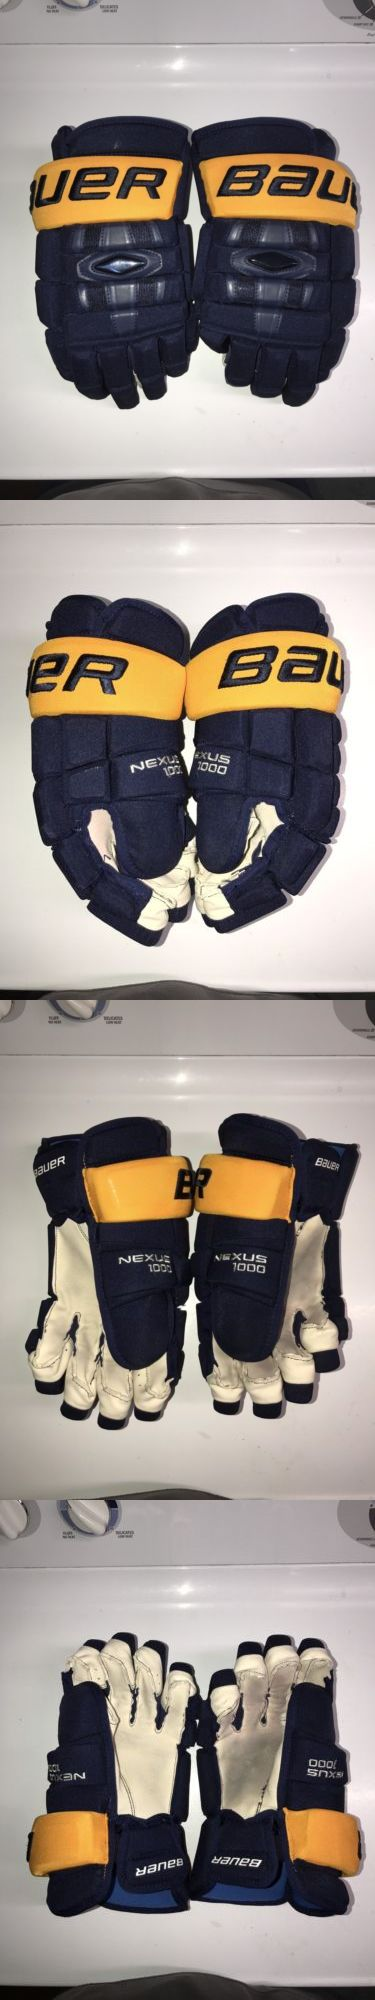 Gloves 20853: Bauer Nexus 1000 Hockey Gloves Buffalo Sabres Pro Return -> BUY IT NOW ONLY: $110 on eBay!